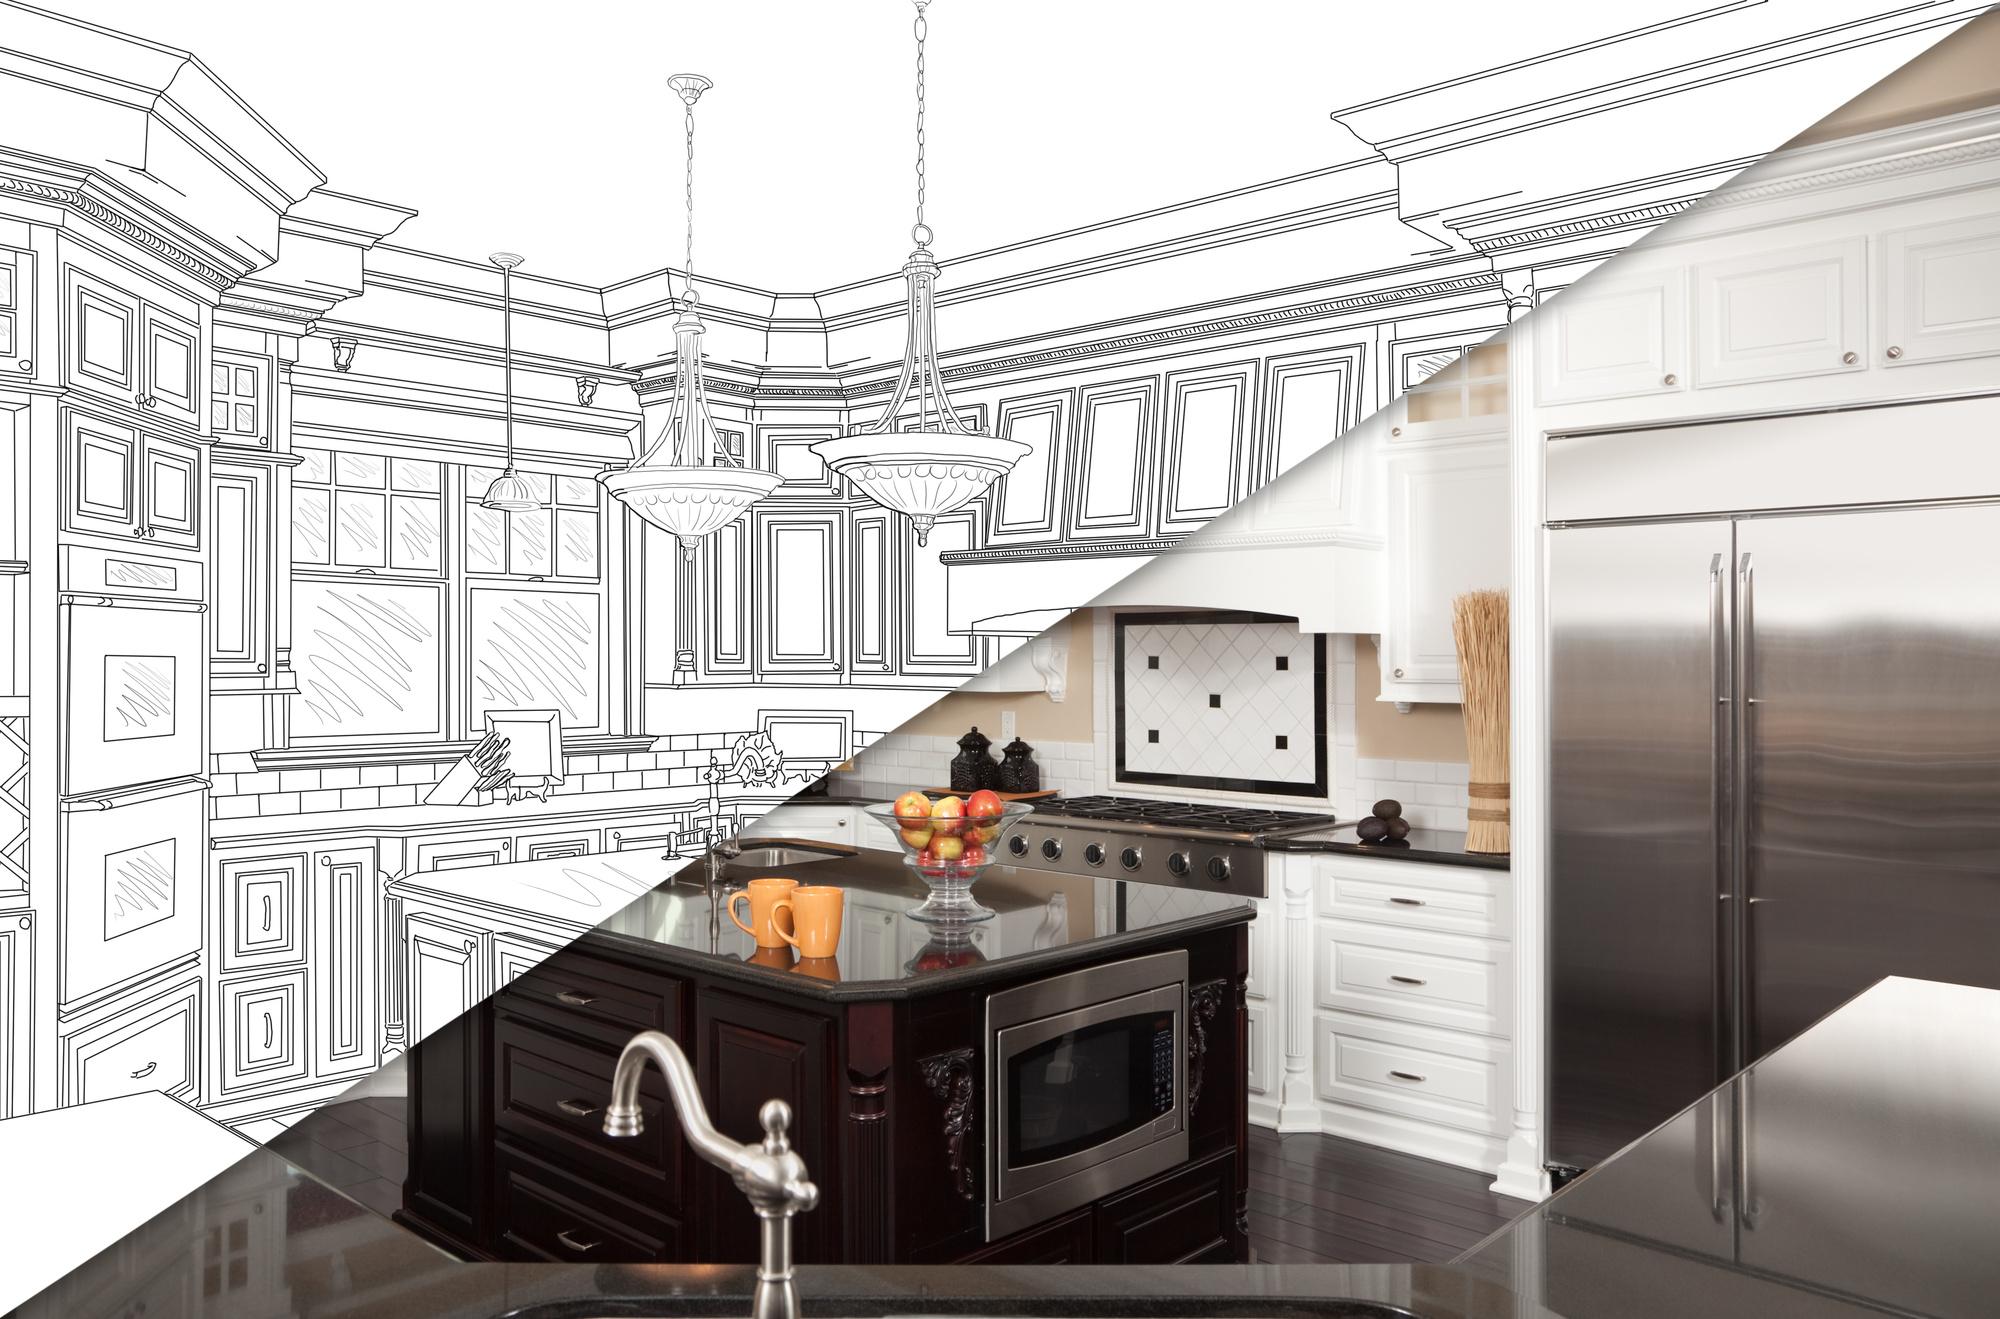 Renovation in real estate